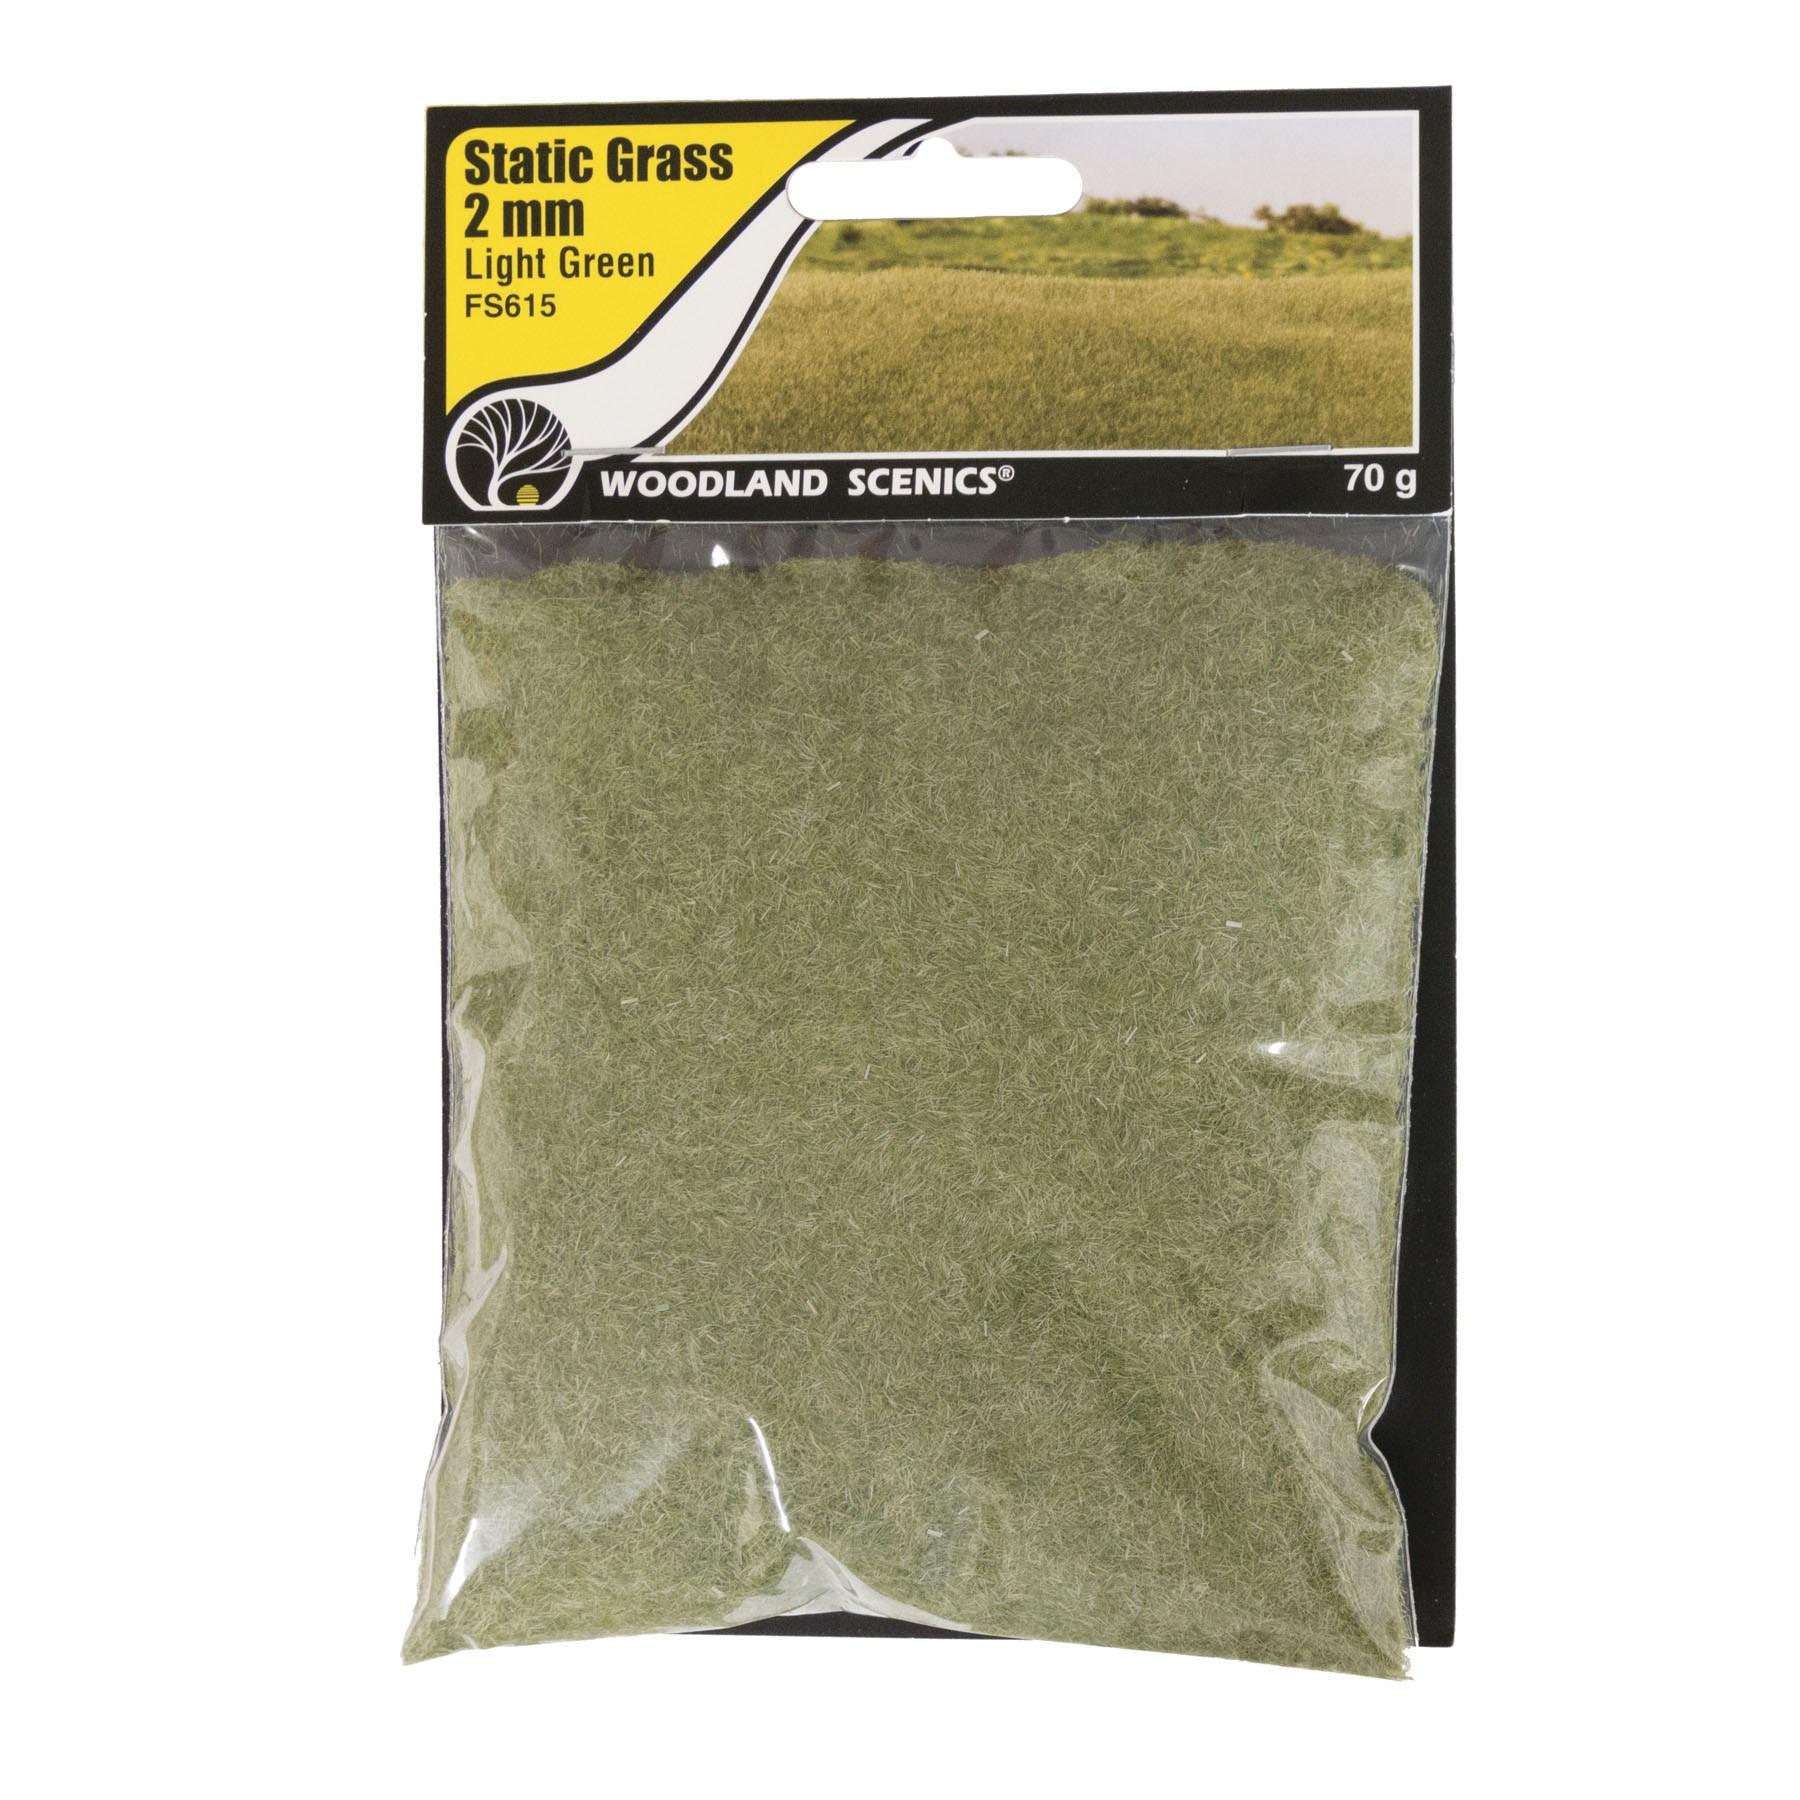 Woodland Scenics - Static Grass, 2mm Light Green